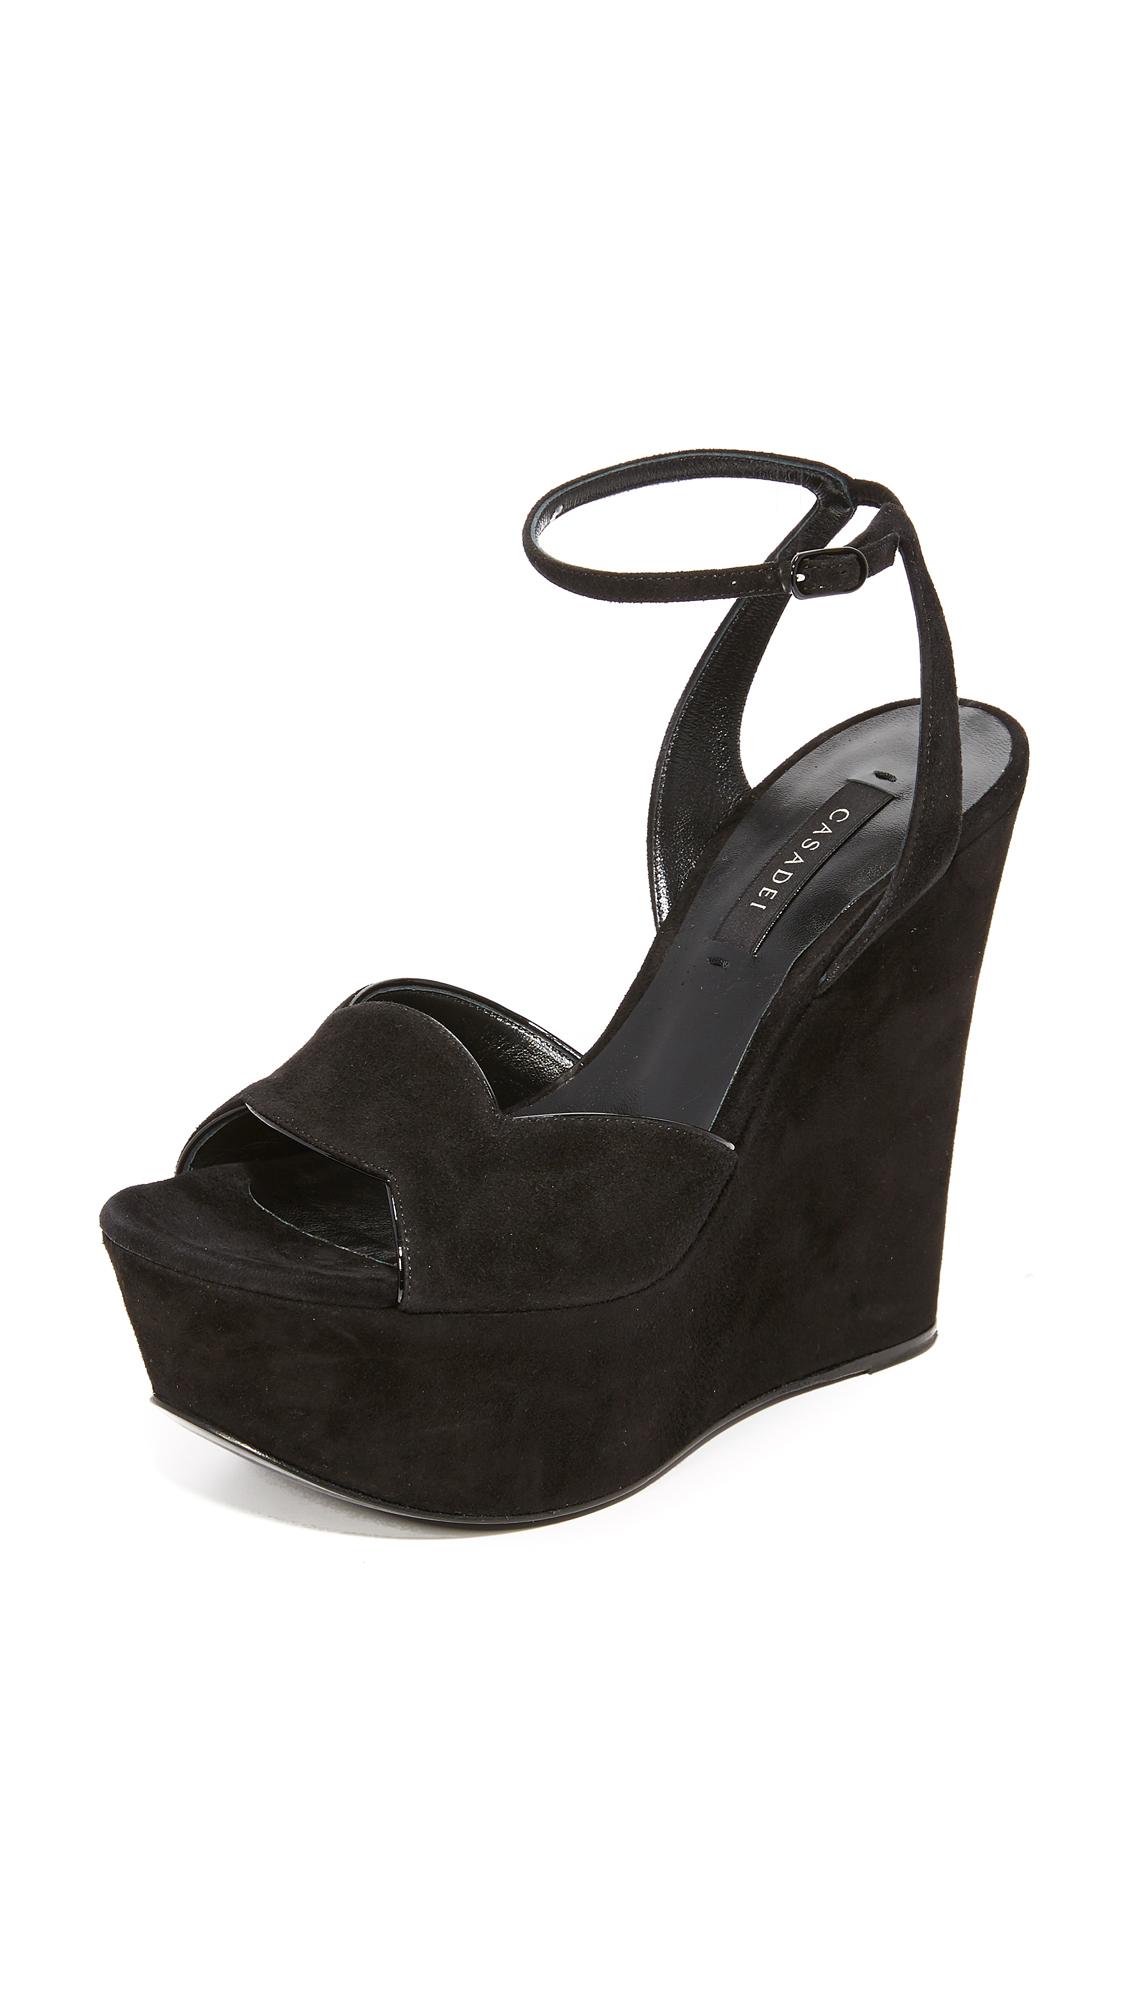 Casadei Wedge Sandals - Black at Shopbop